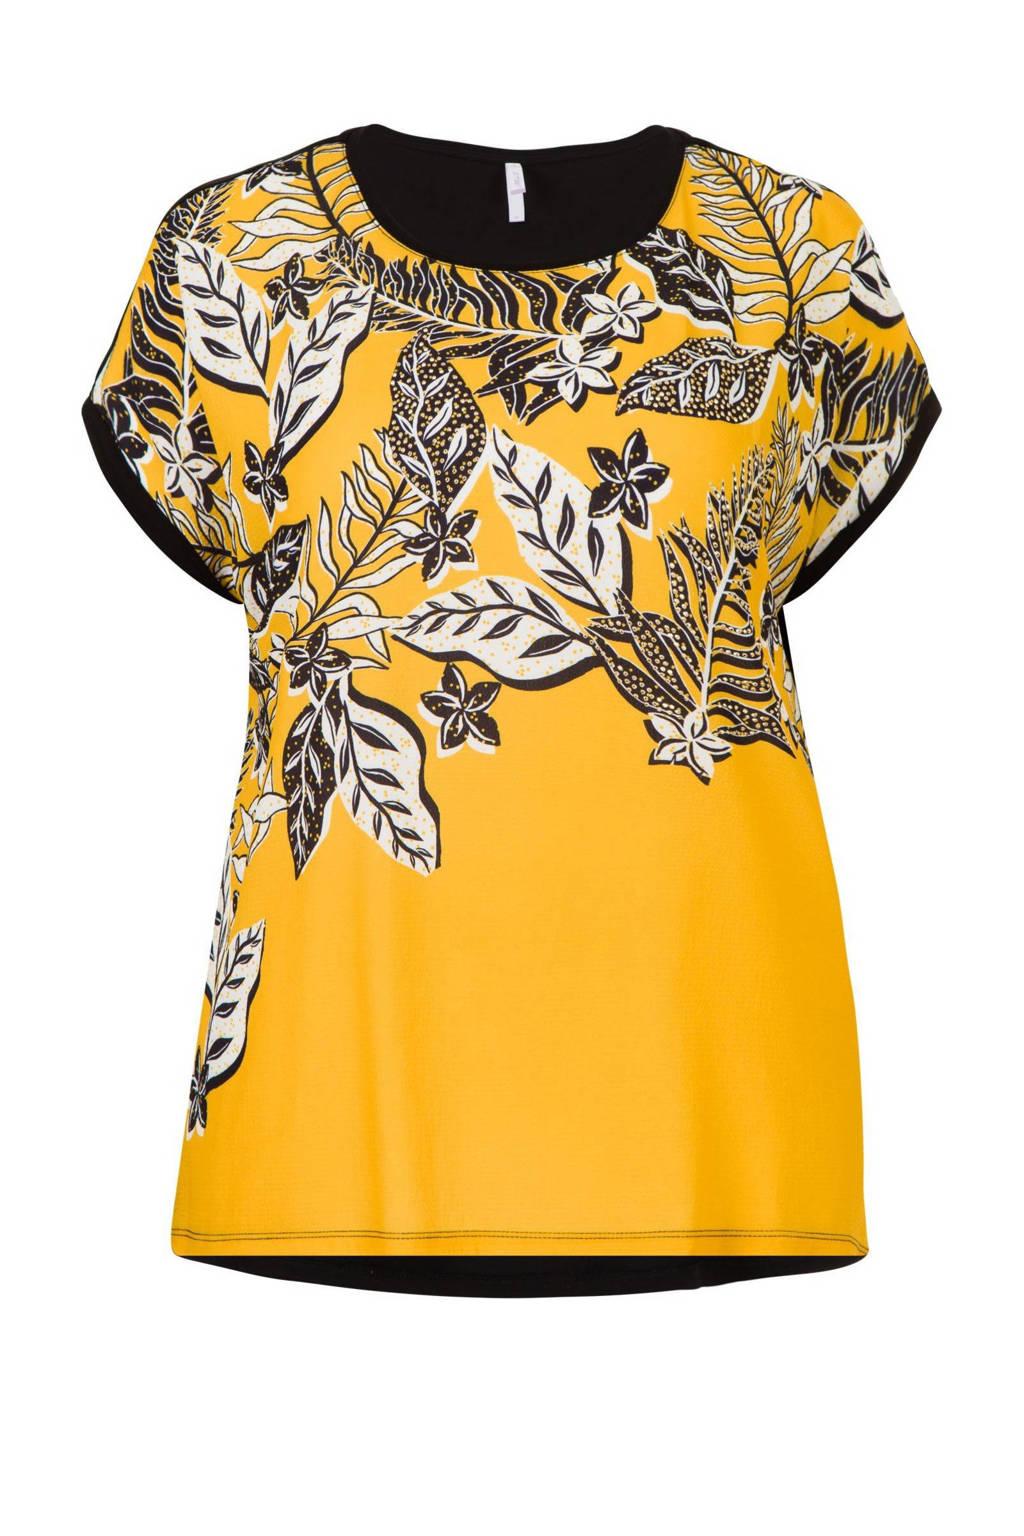 Miss Etam Plus T-shirt met bladprint geel/zwart, Geel/zwart